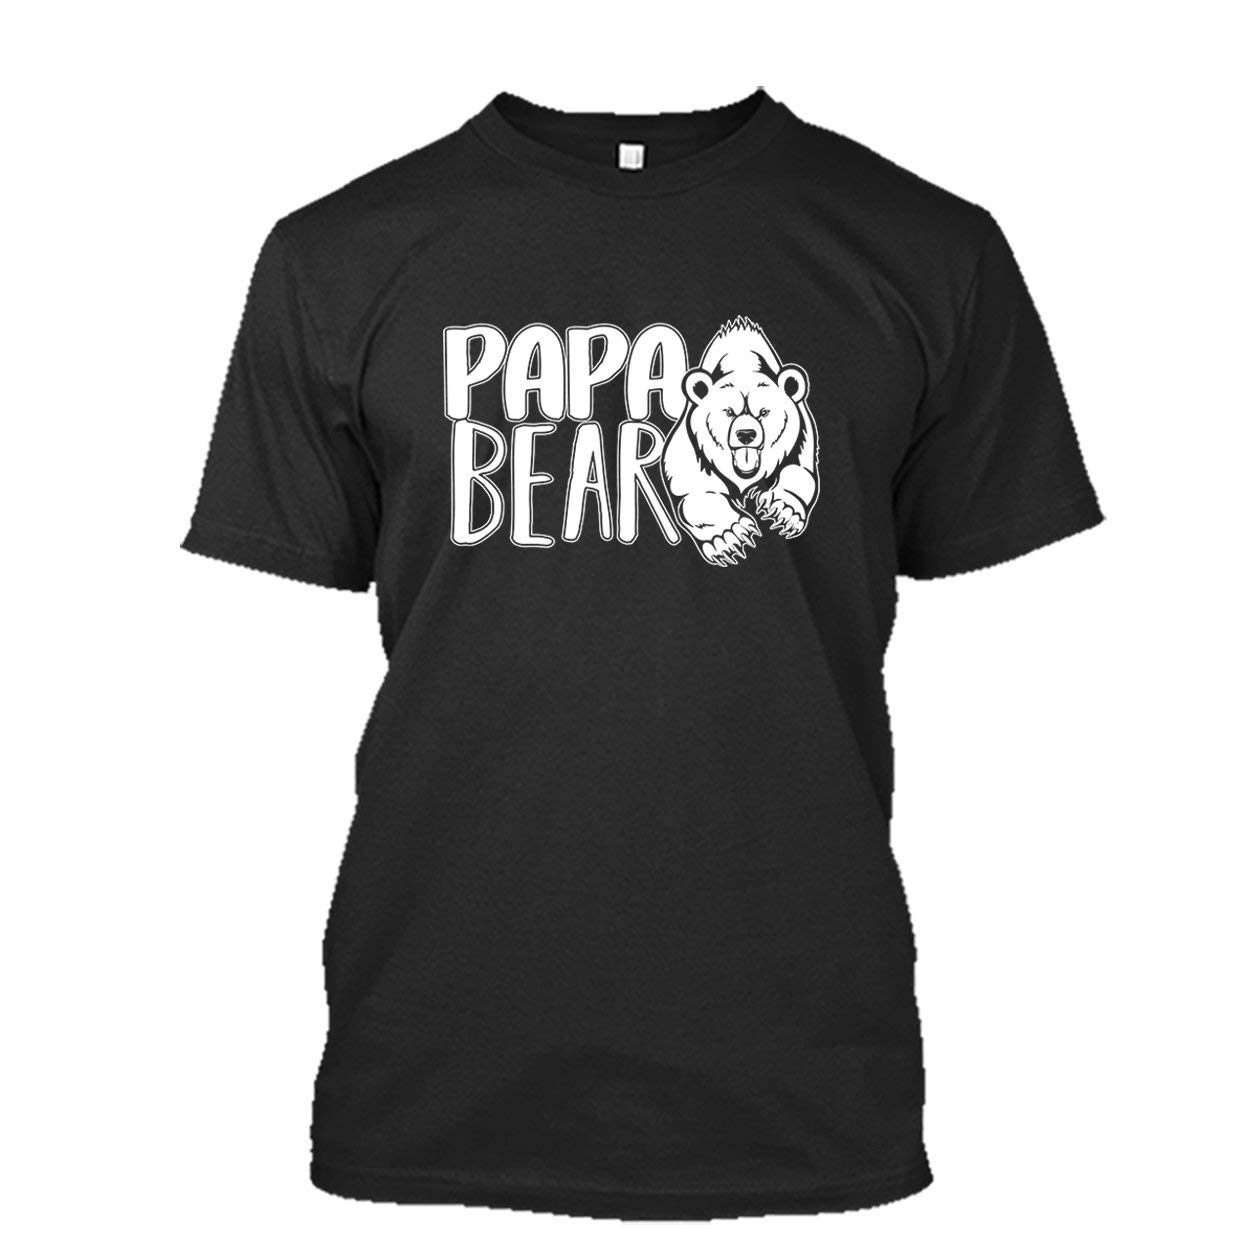 Papa Bear Shirt, Unisex Short Sleeve Tee, Clothes